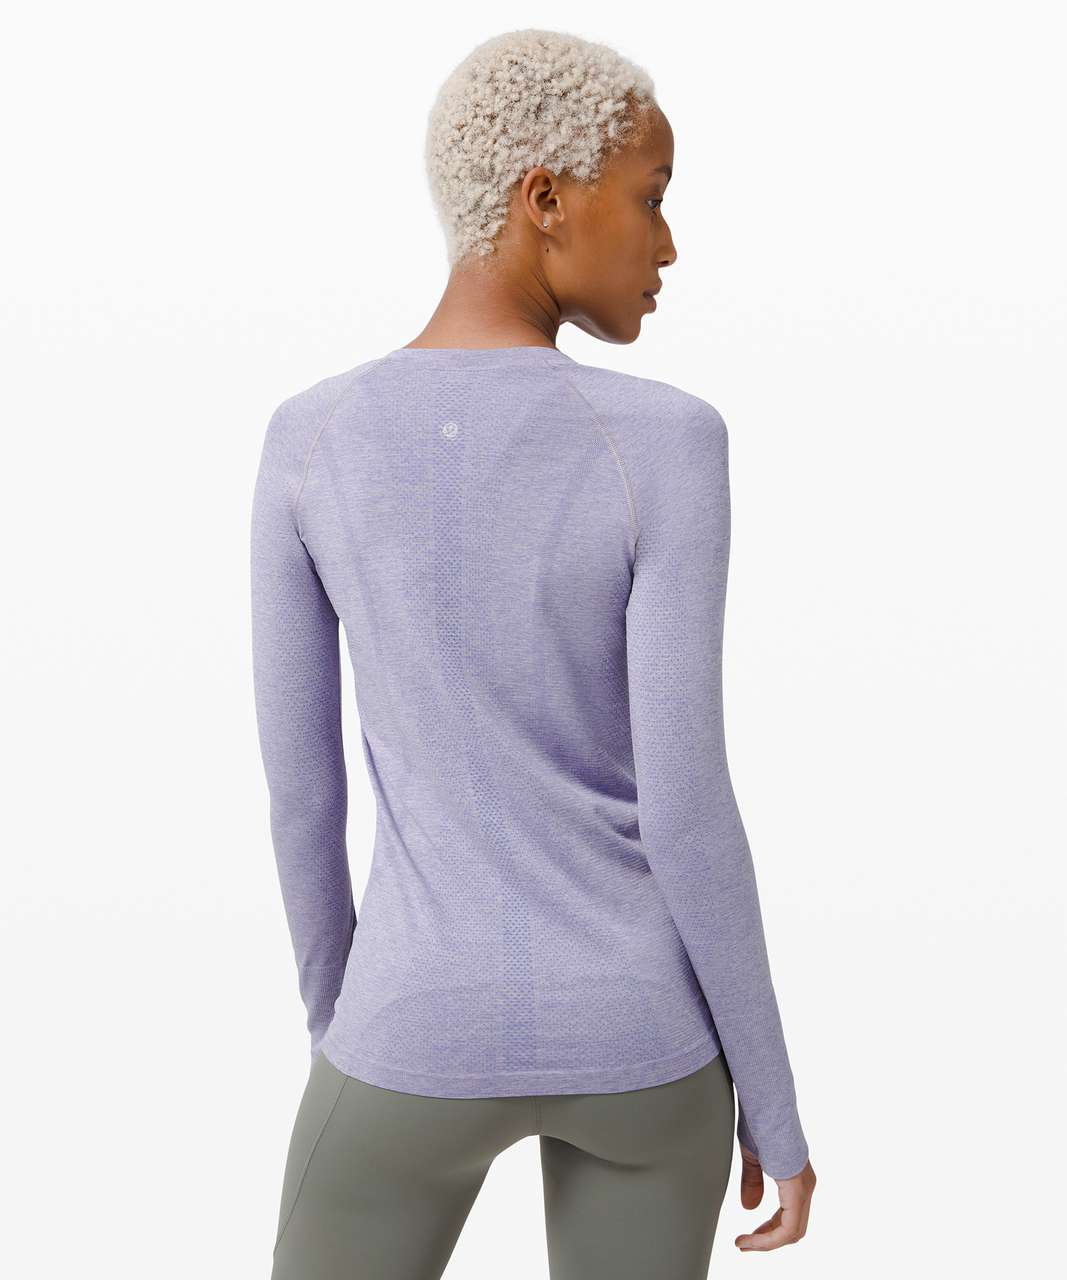 Lululemon Swiftly Tech Long Sleeve 2.0 - Peri Purple / Iced Iris